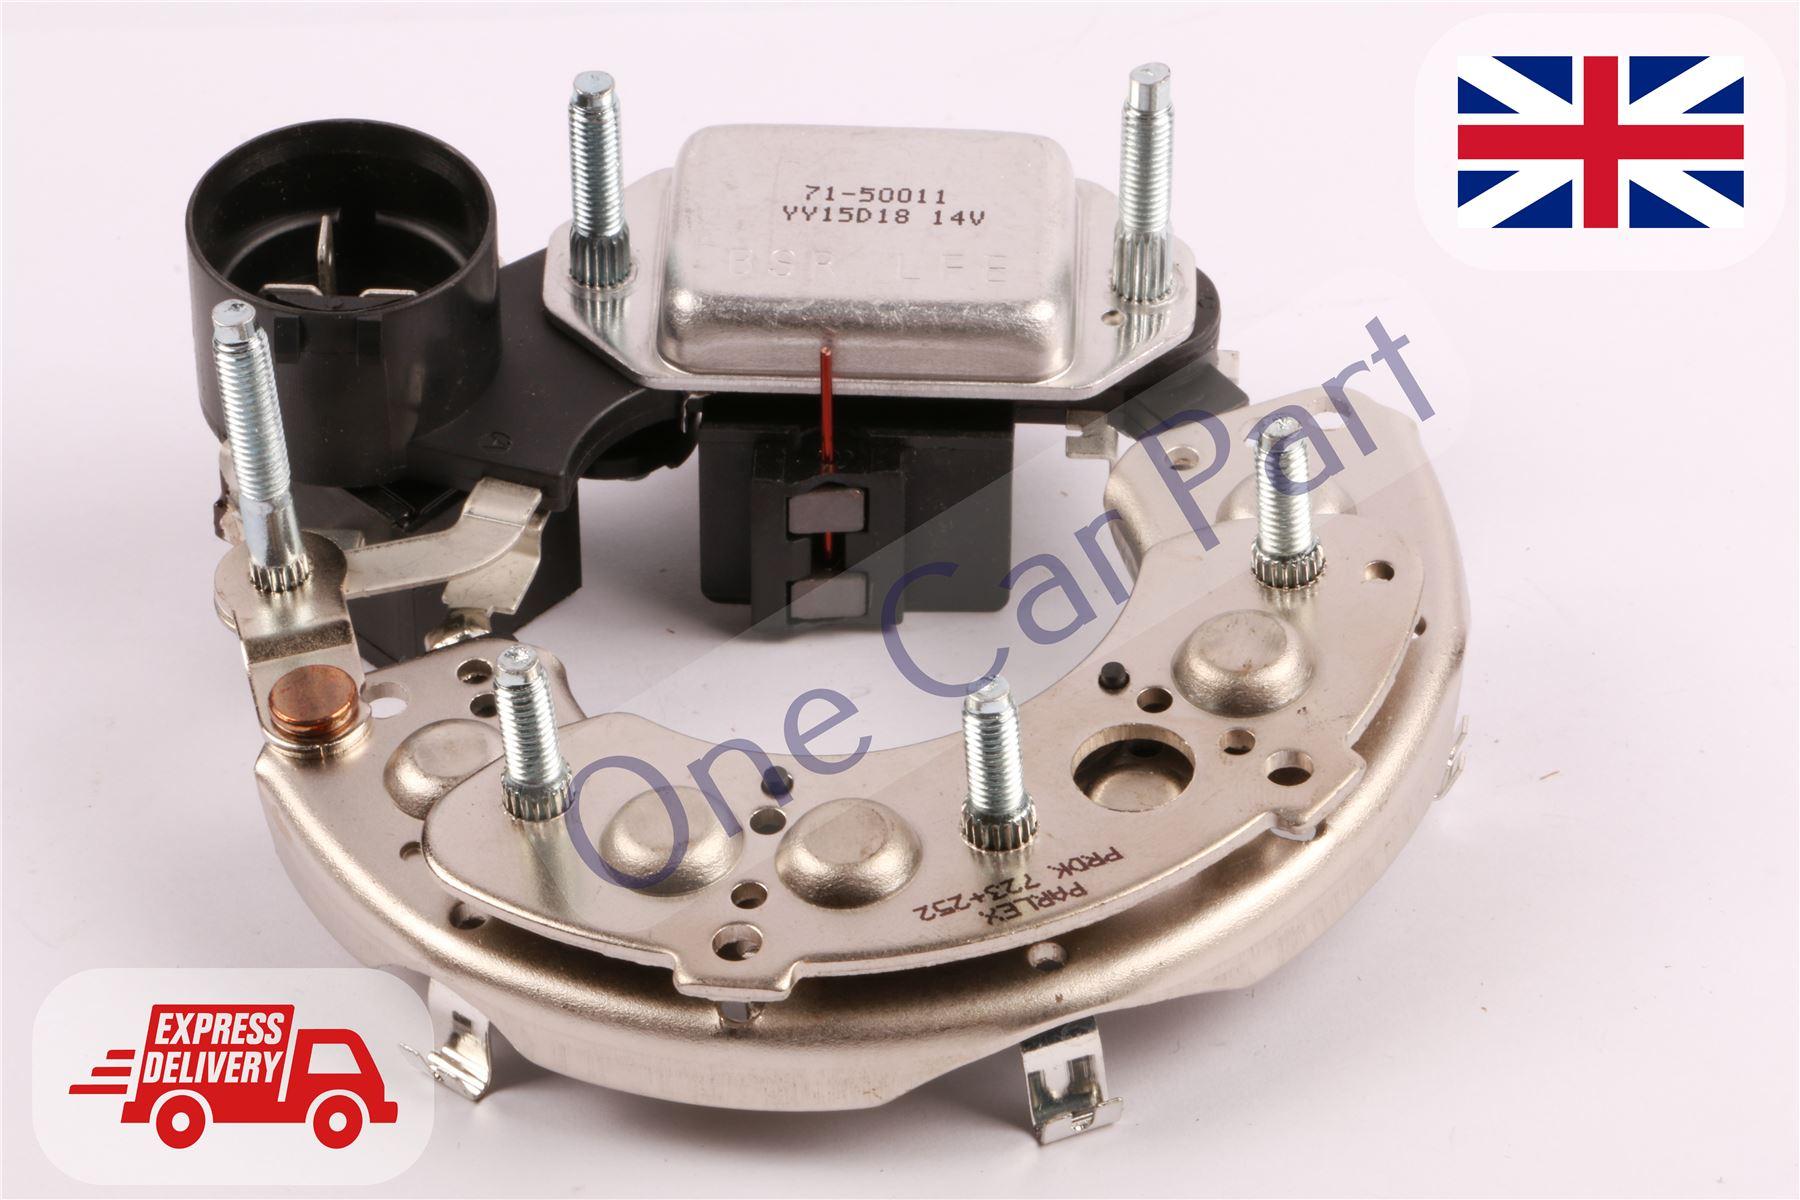 Mobiletron JEEP CHRYSLER alternateur redresseur 12-50 amp diodes M8 117mm batterie